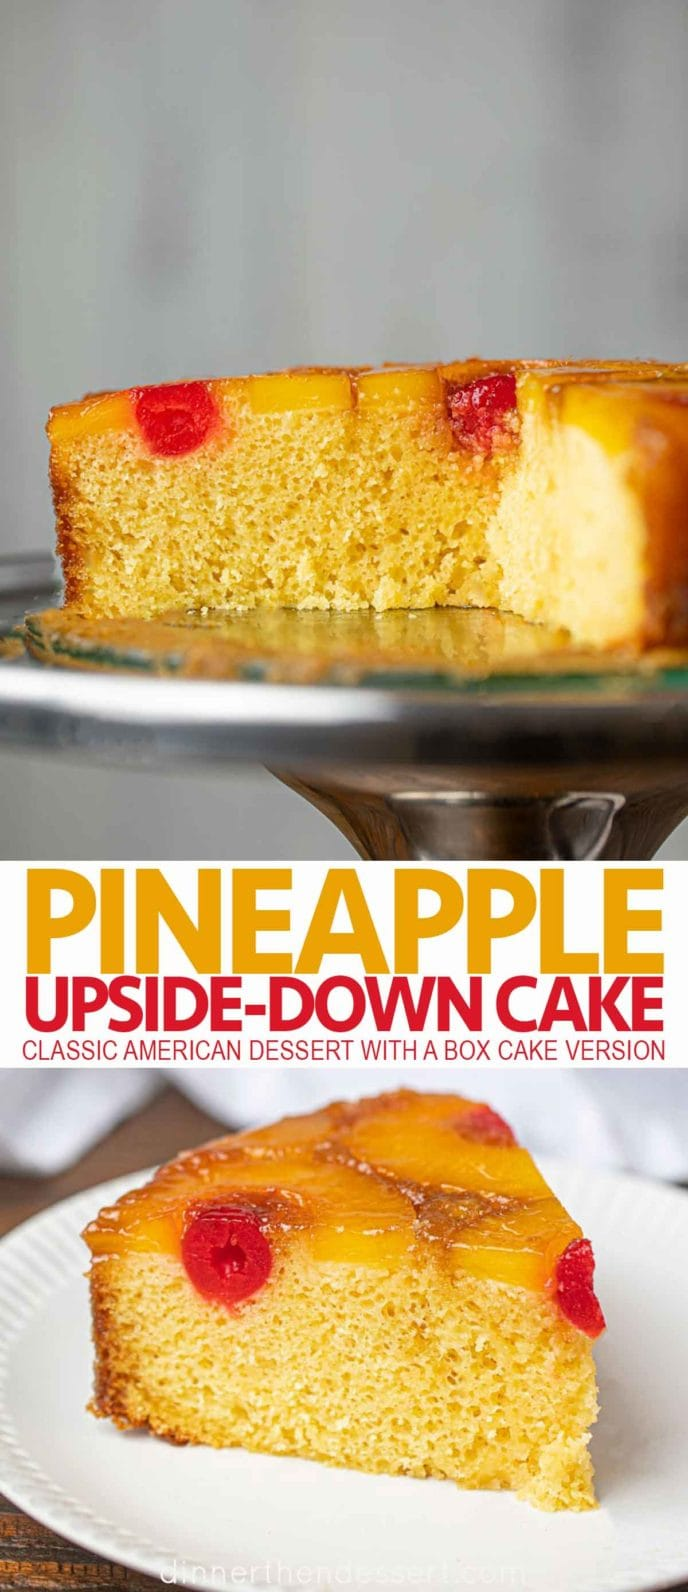 Cut Pineapple-Upside Down Cake